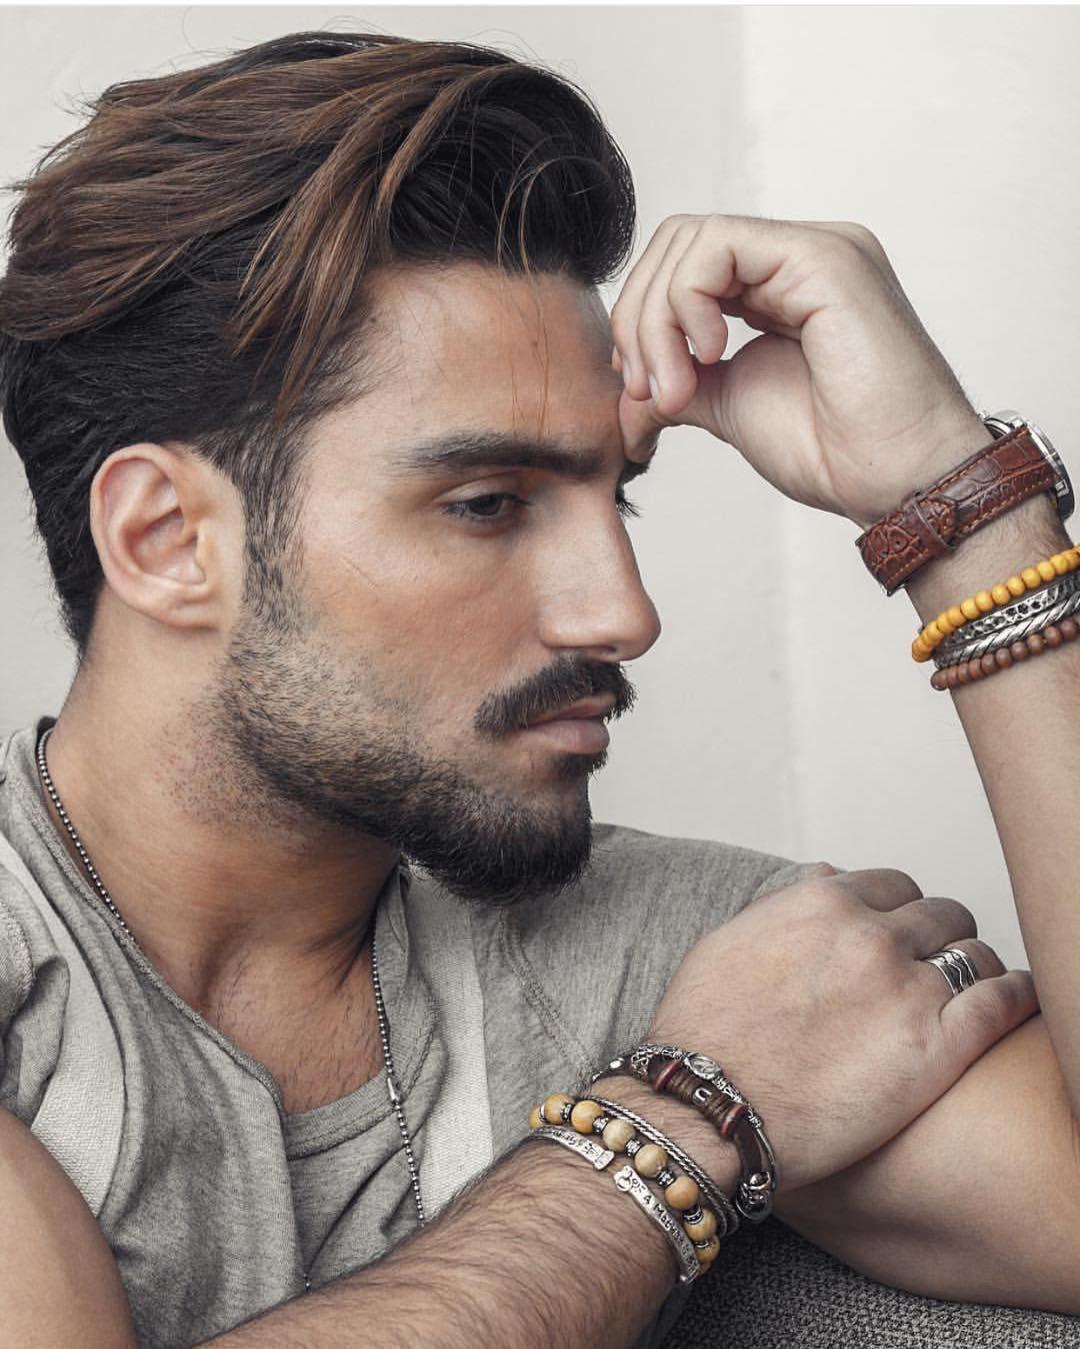 Men's haircut side part pin by glenn i sleu on mariano divaio  pinterest  hair styles